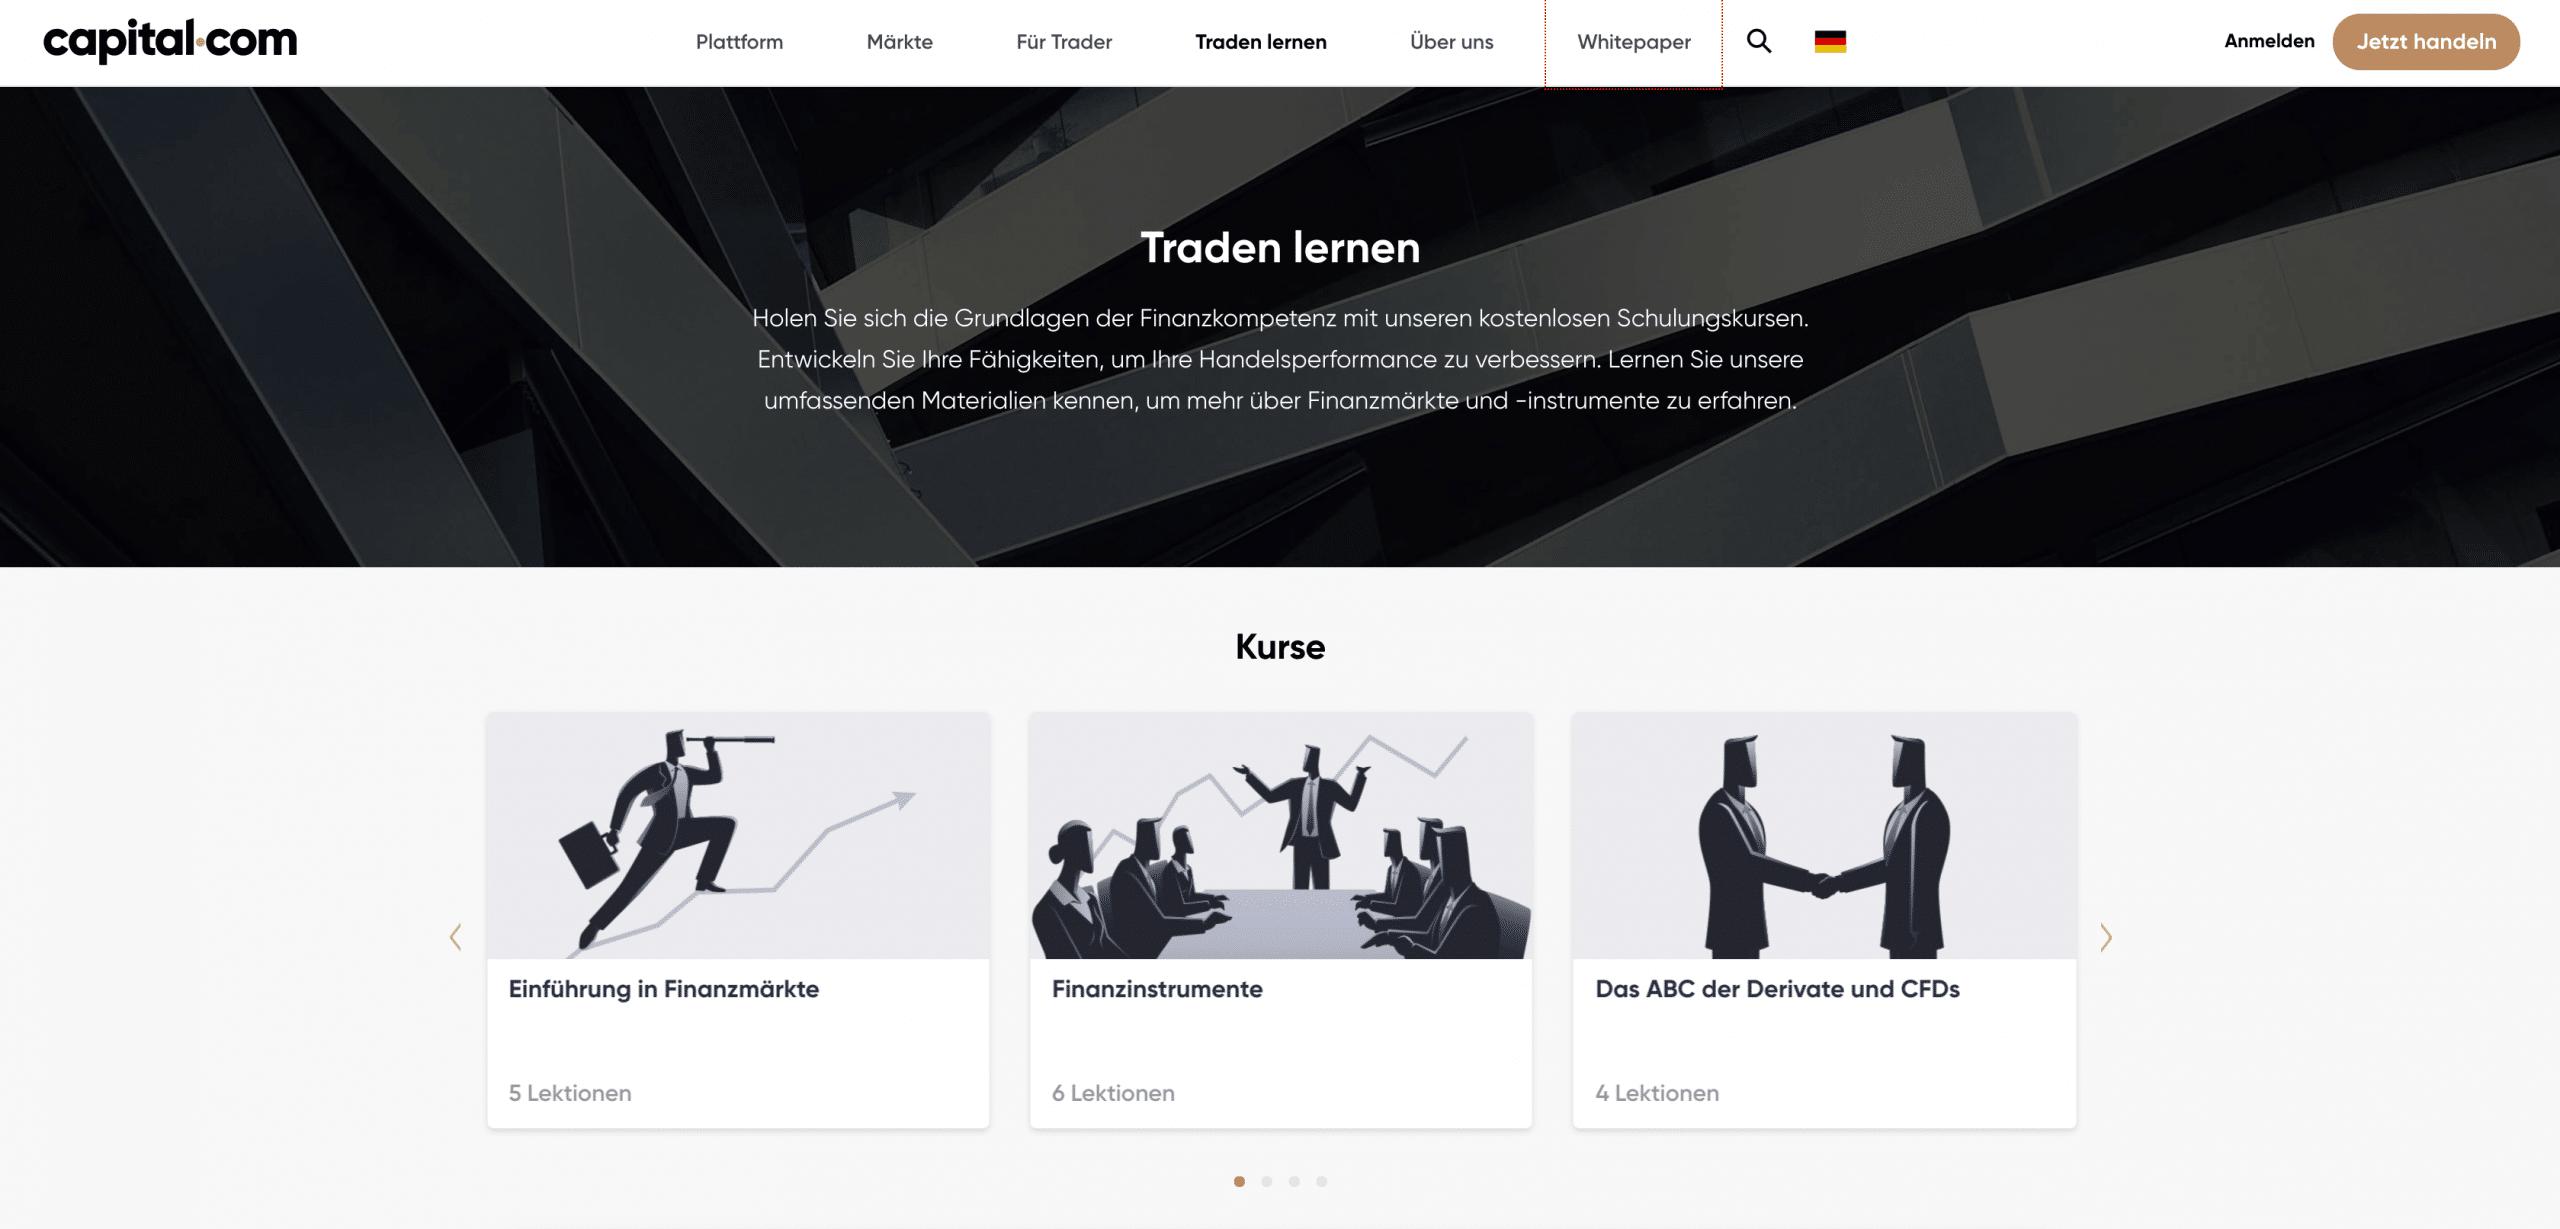 Capital.com Weiterbildung